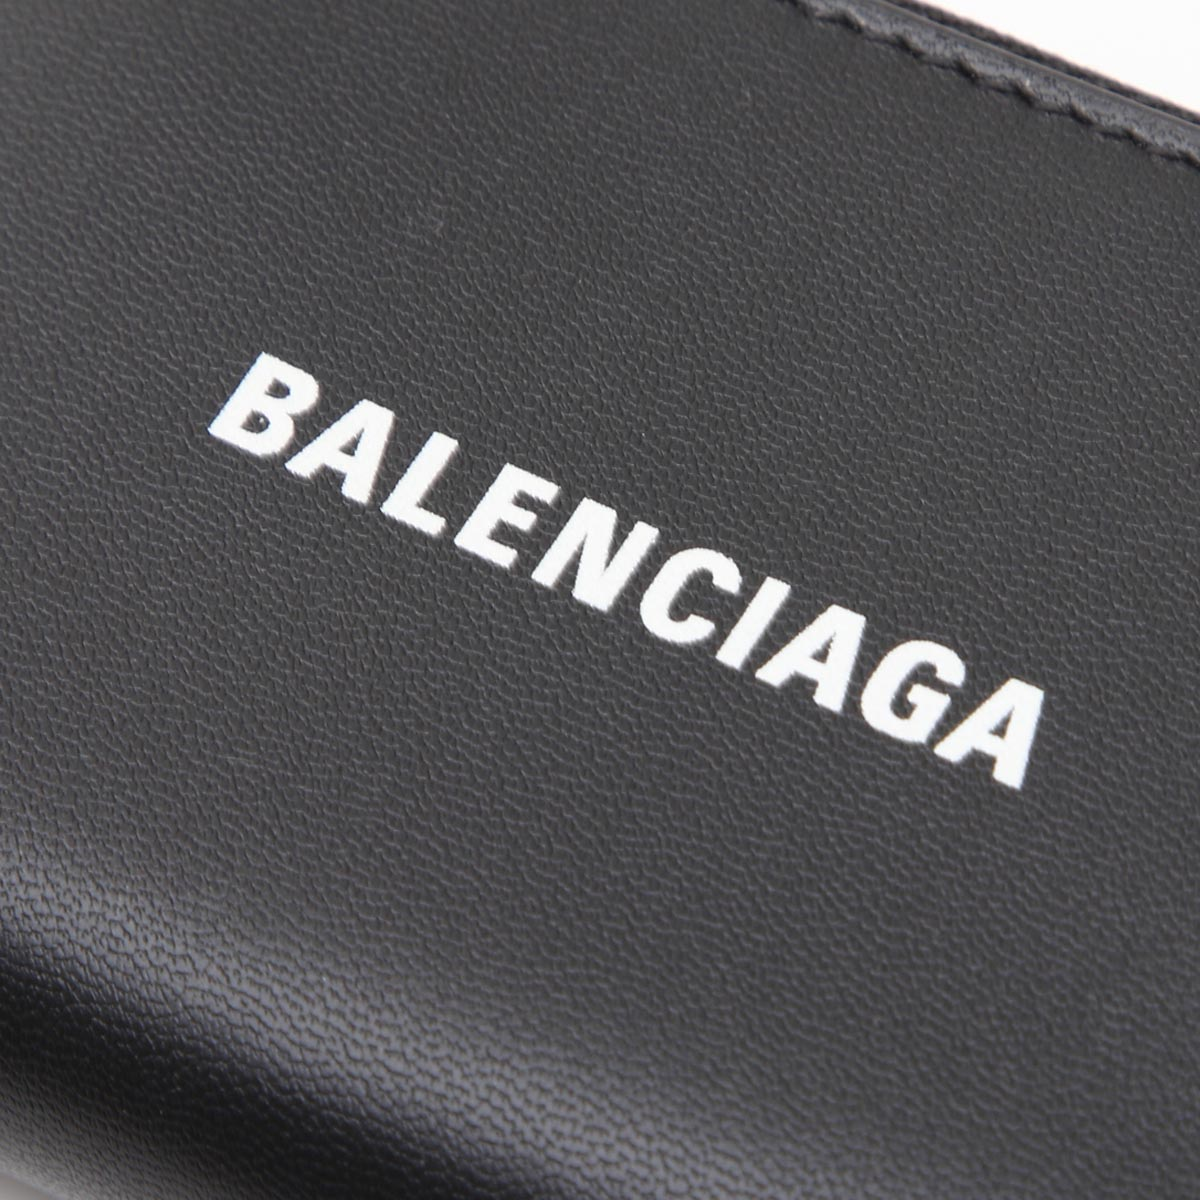 BALENCIAGA バレンシアガ カードケース メンズ